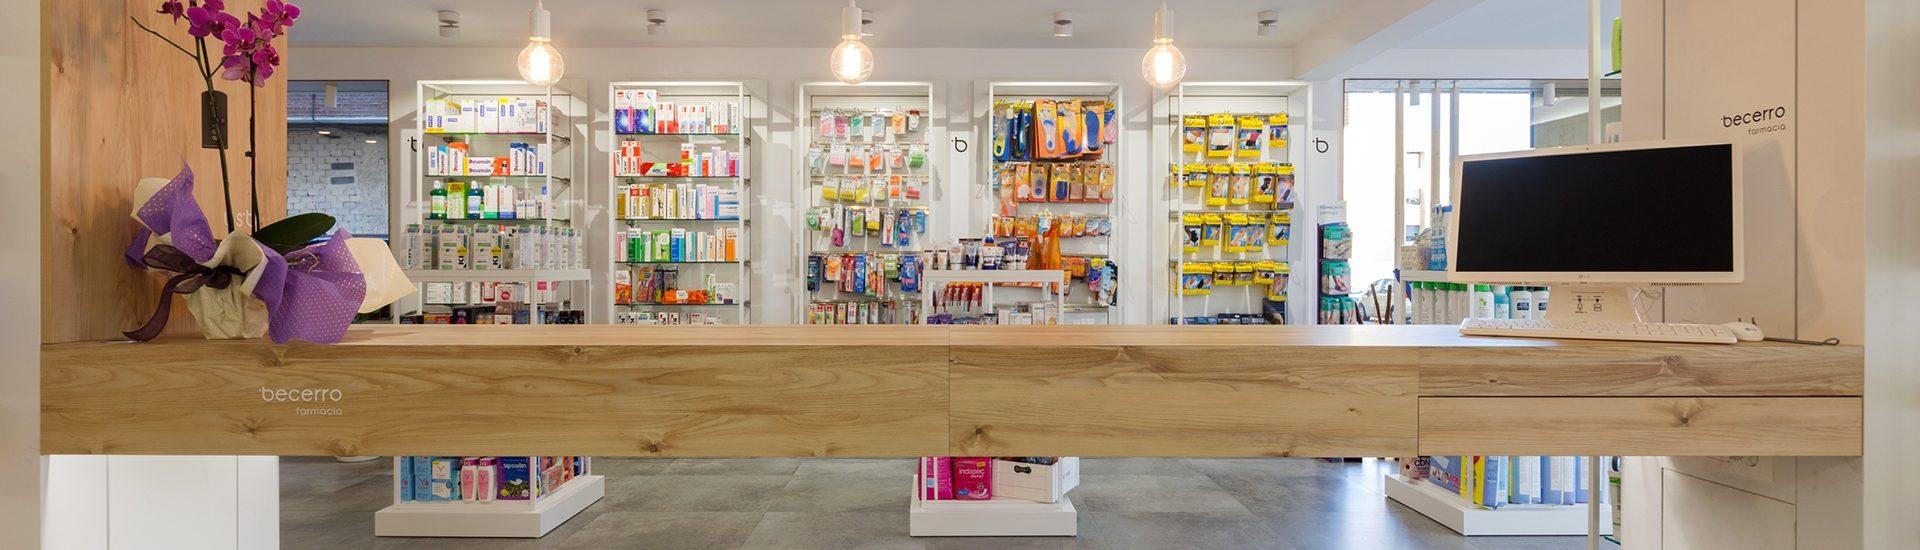 Farmacia Becerro 14